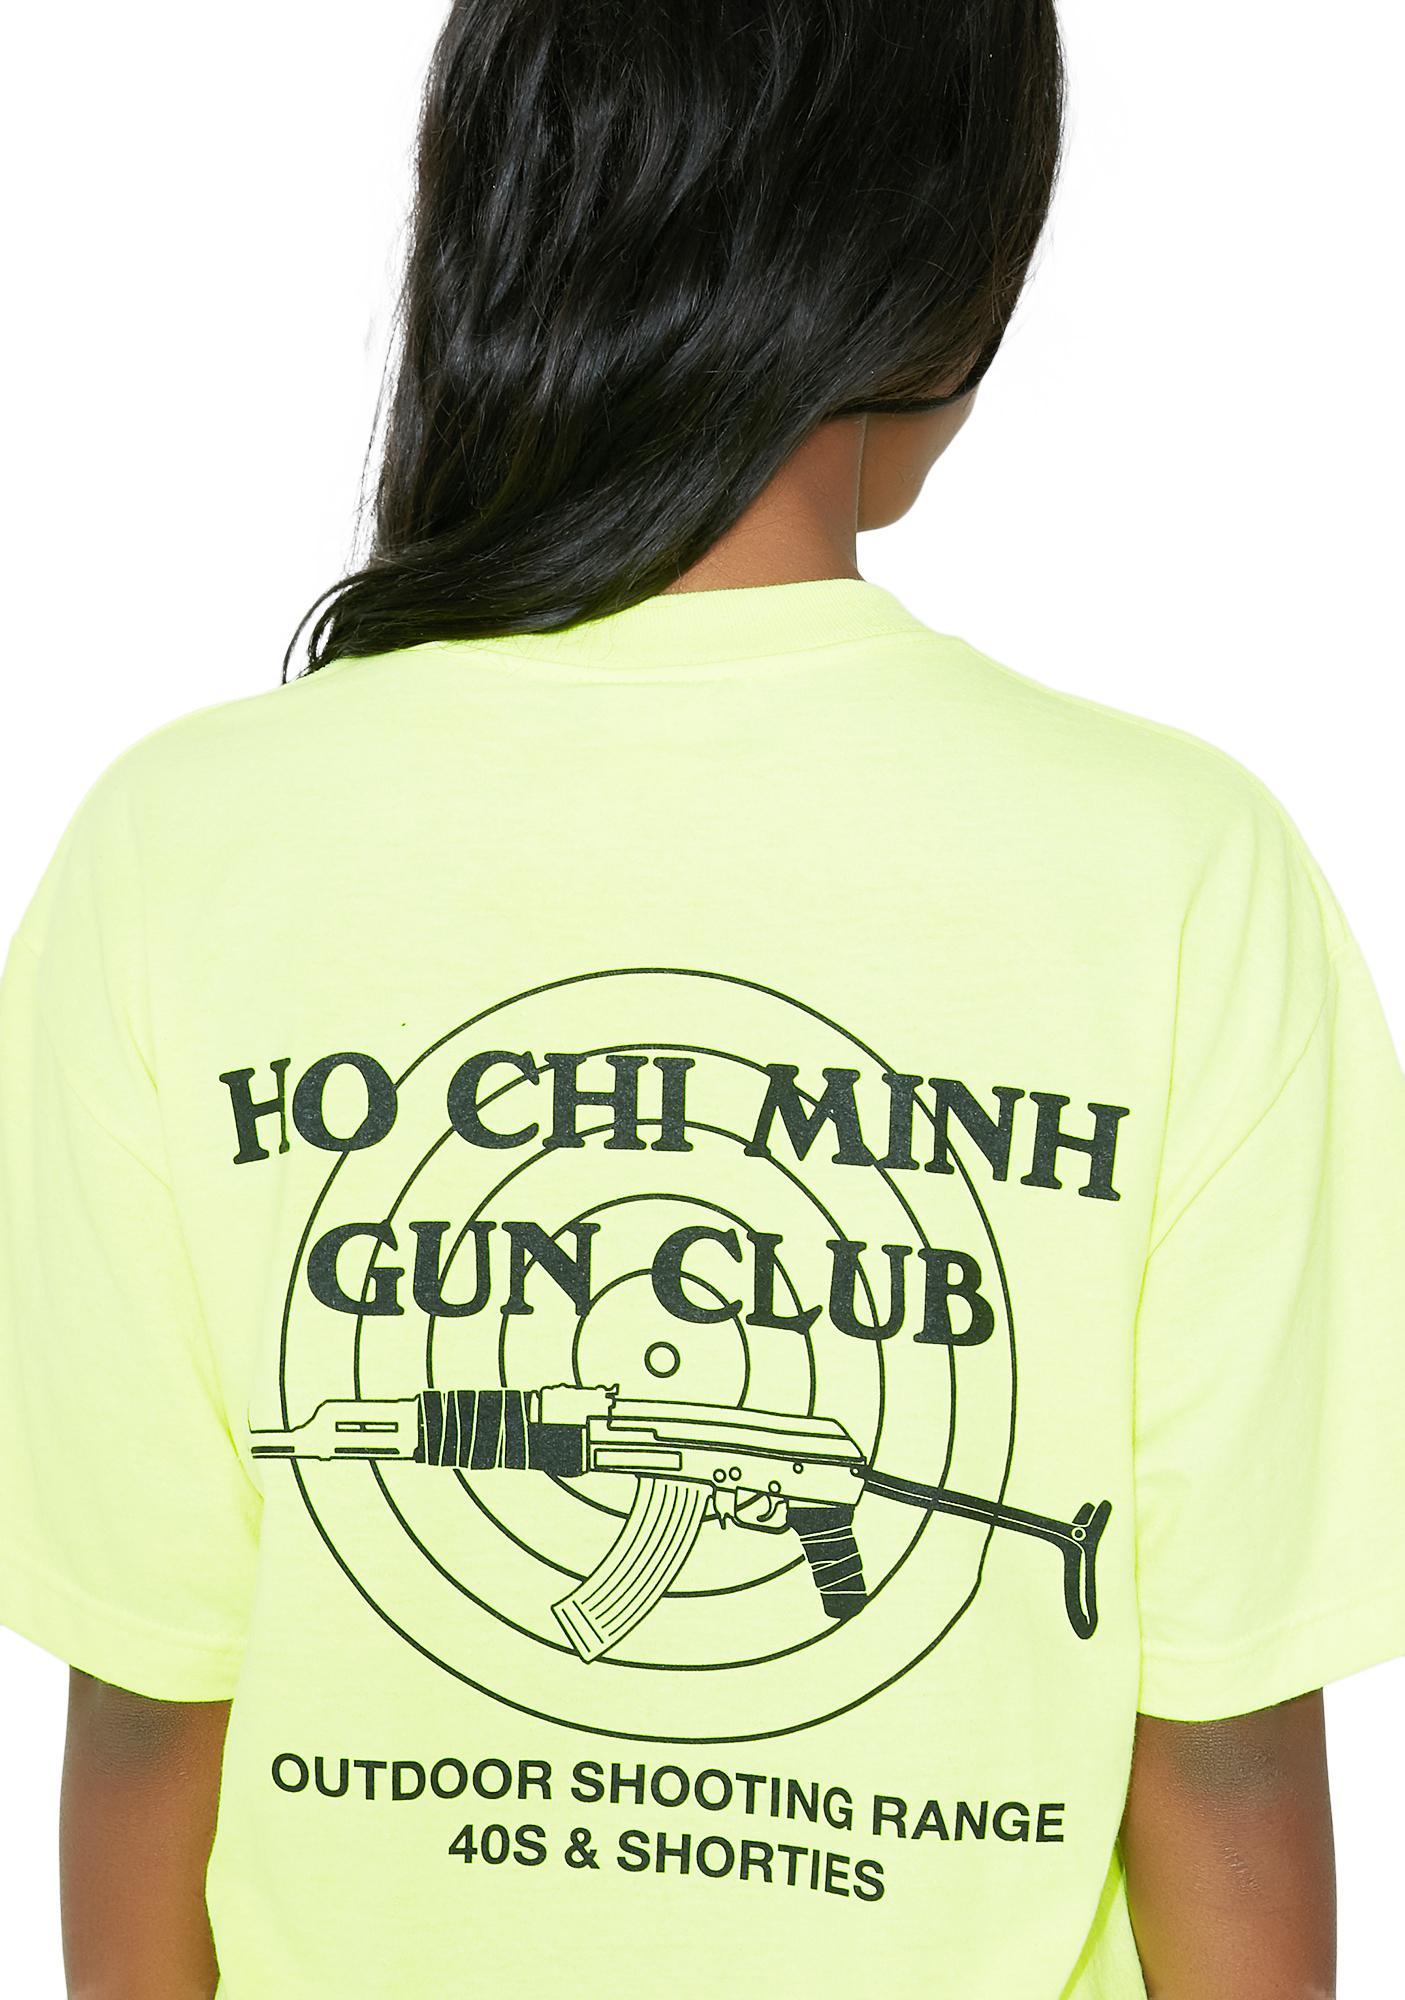 40s & Shorties Gun Club Tee